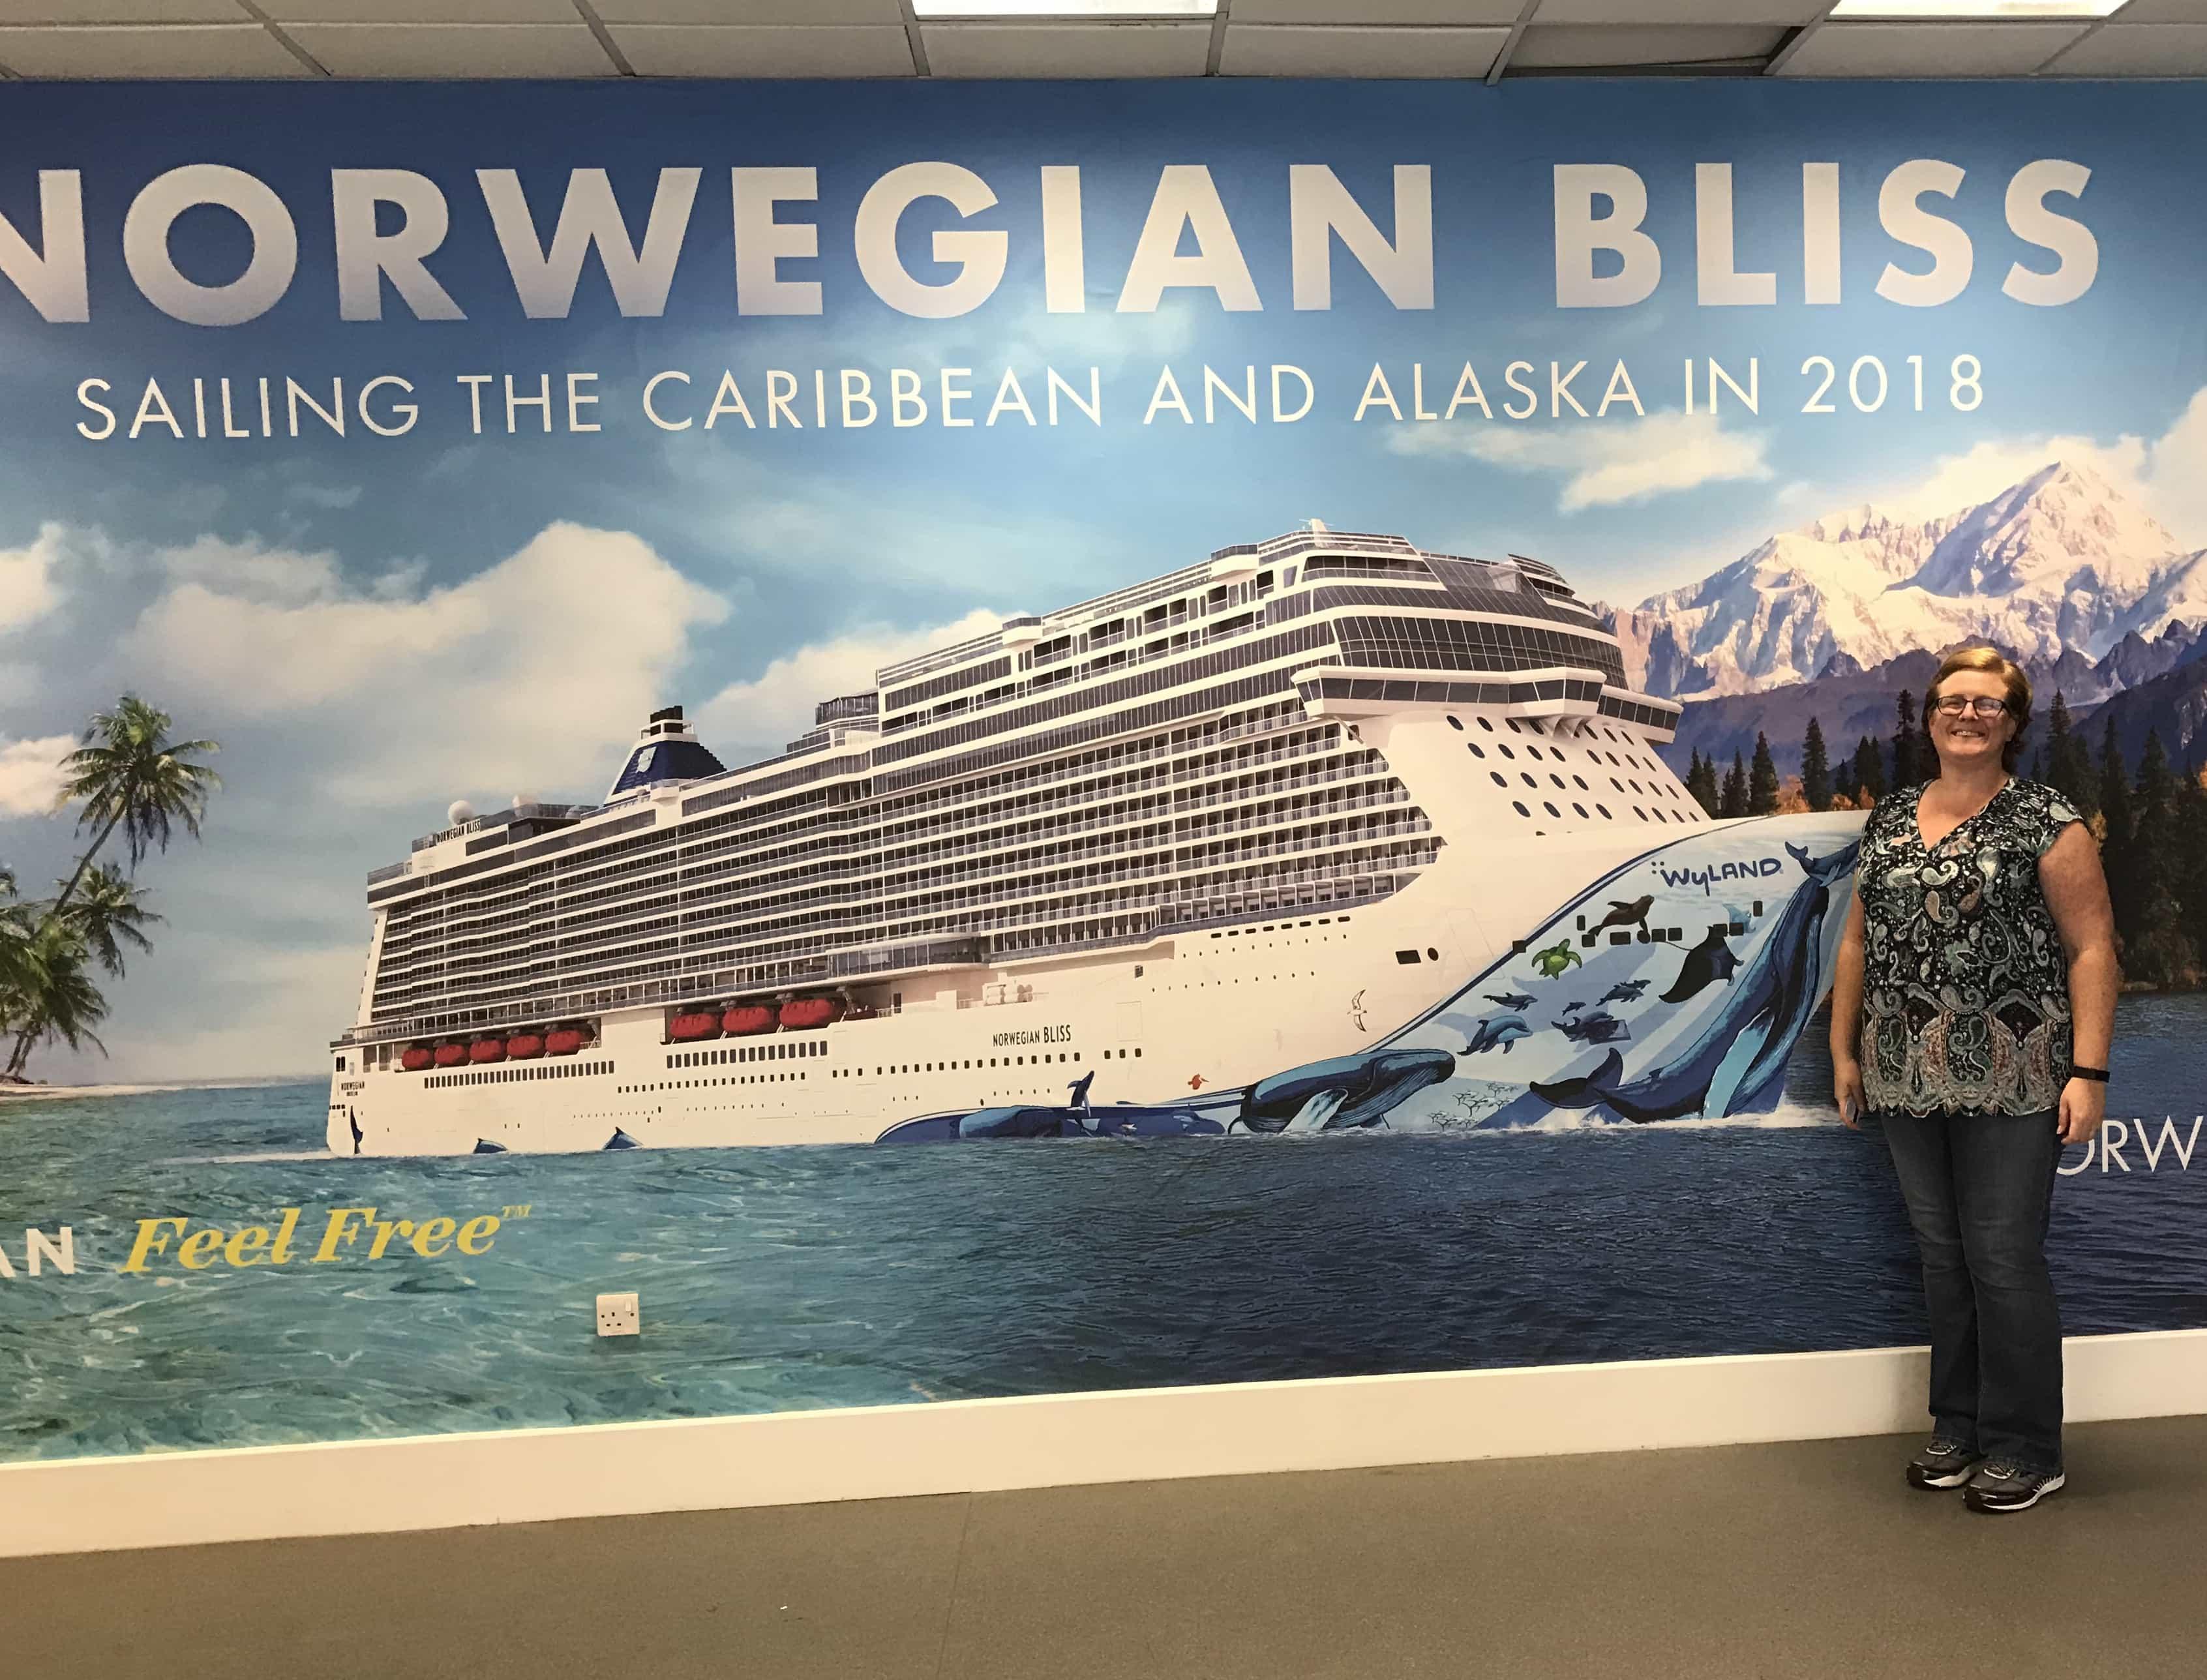 norwegian bliss cruise review